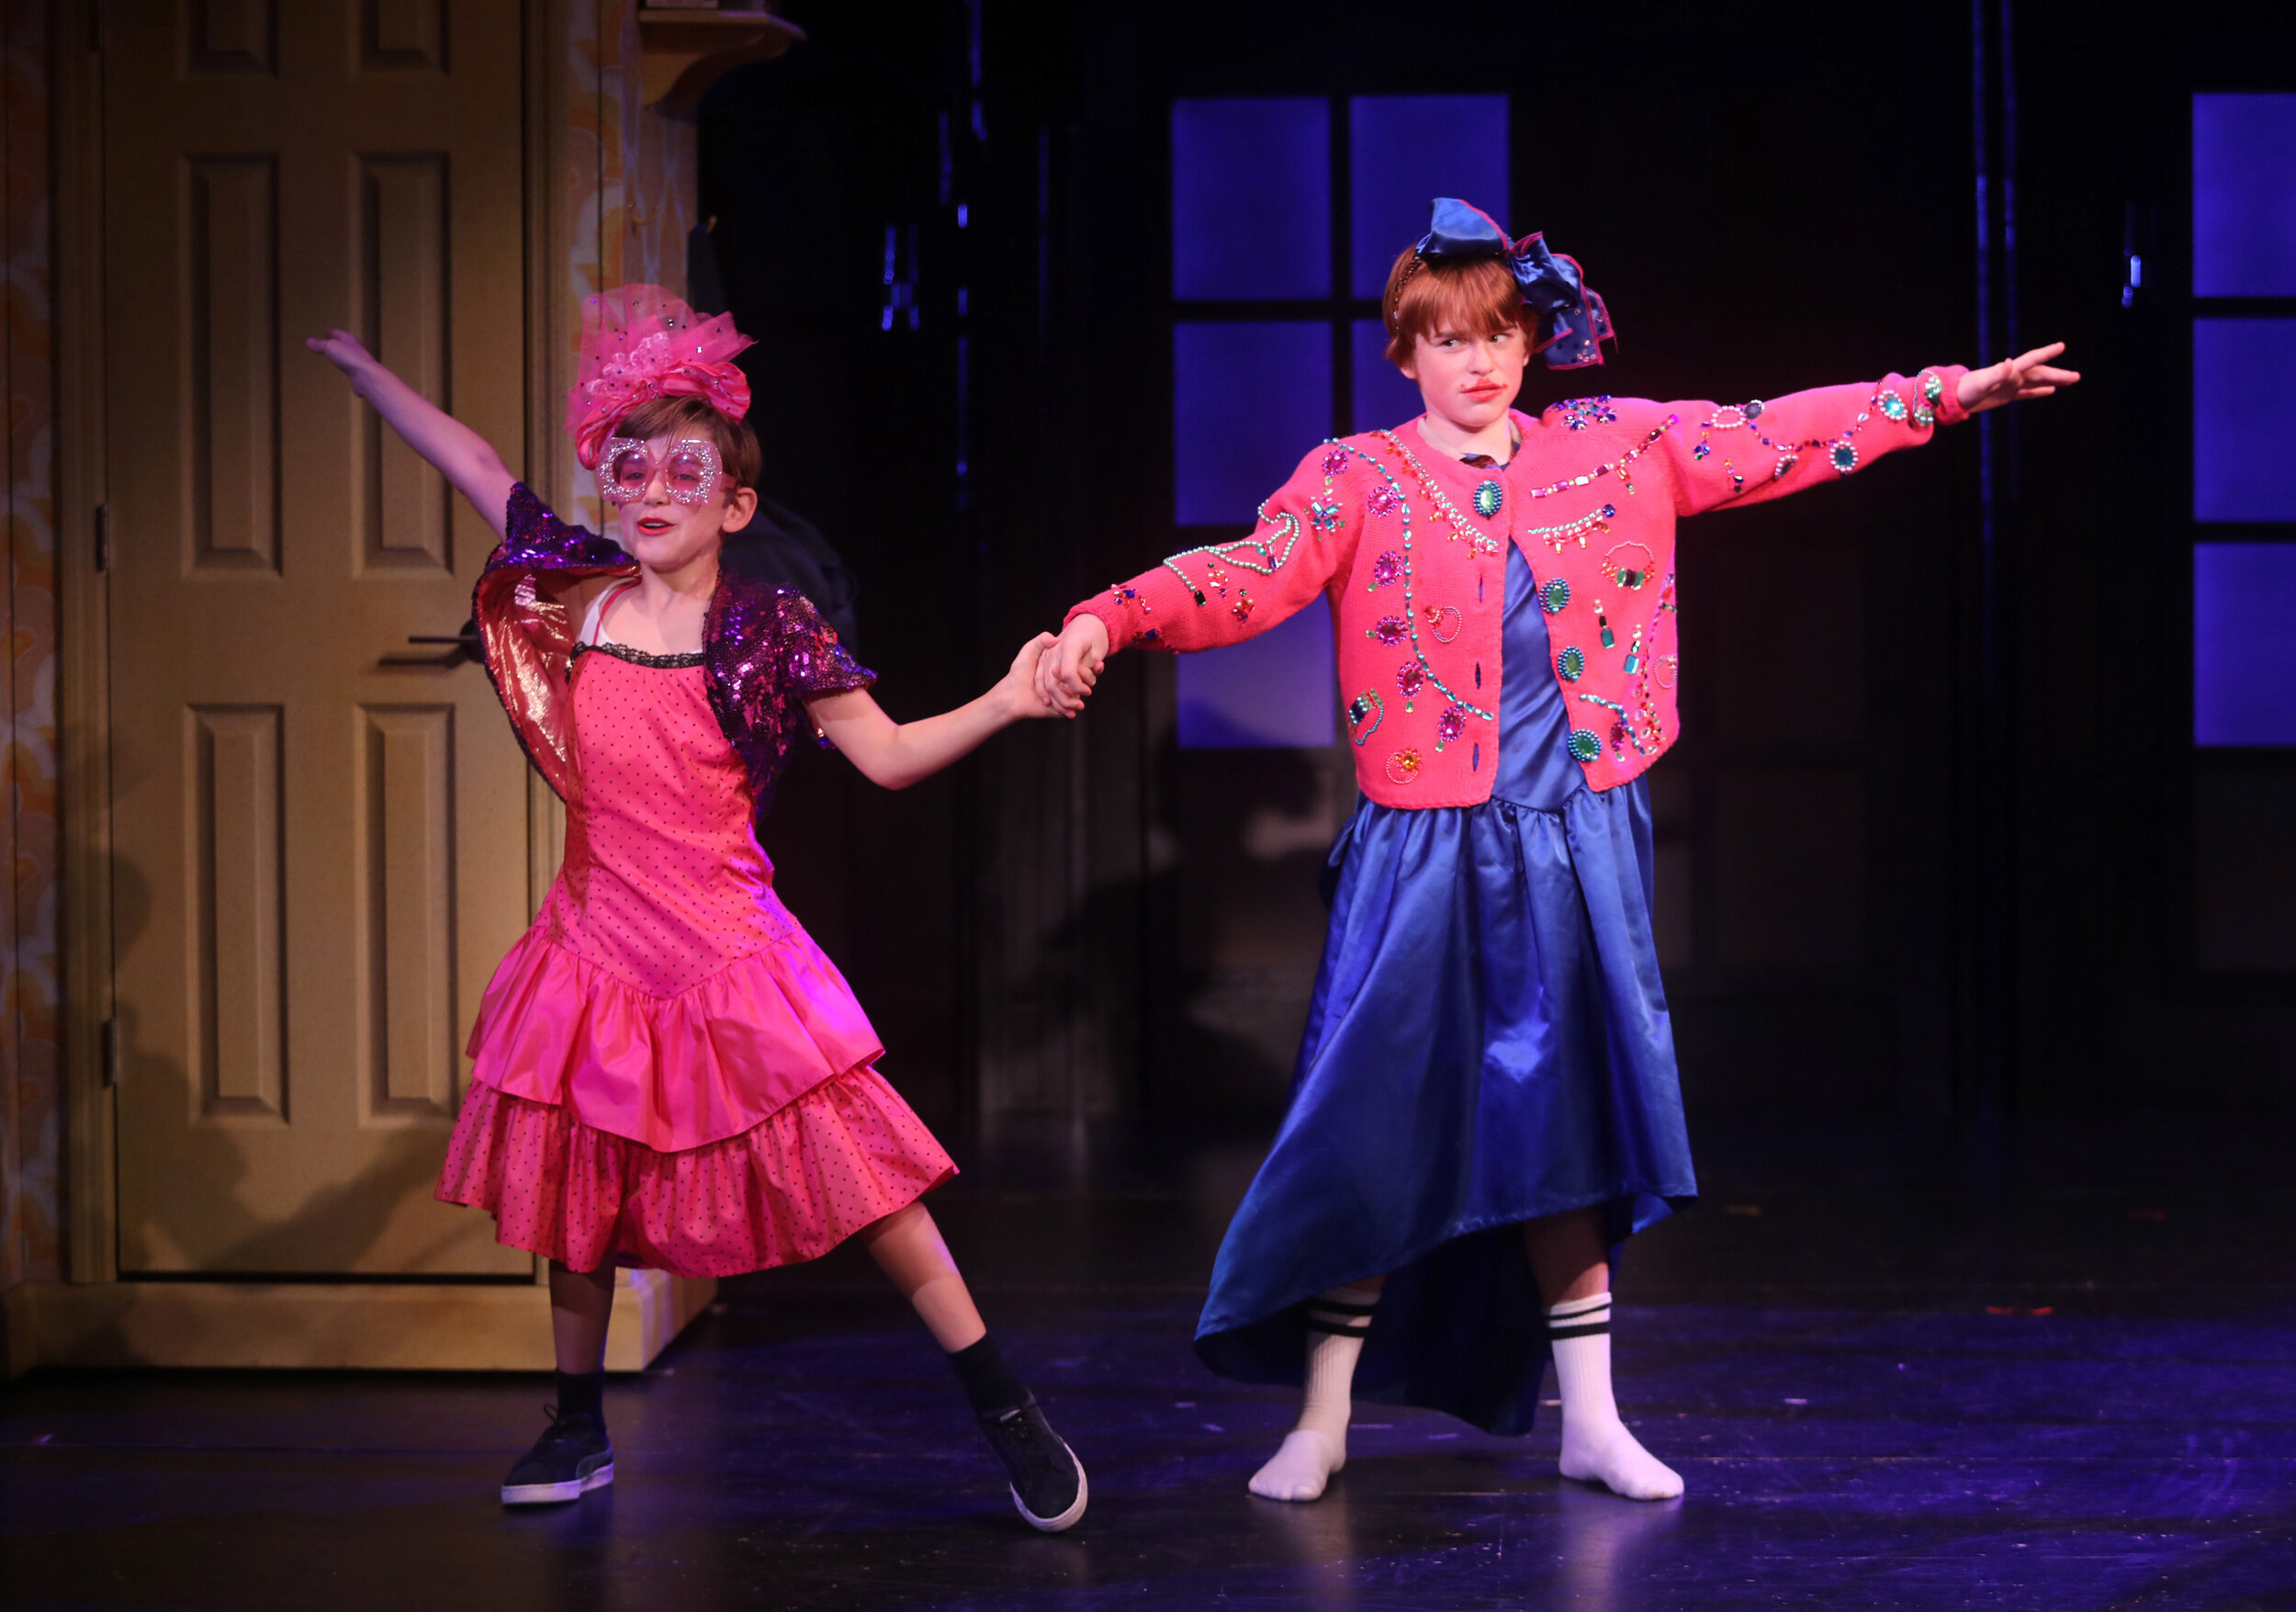 Michael (Jon Martens) and Billy (Liam Vincent Hutt) in Goodspeed Musicals'  Billy Elliot The Musical.  Photo by Diane Sobolewski.